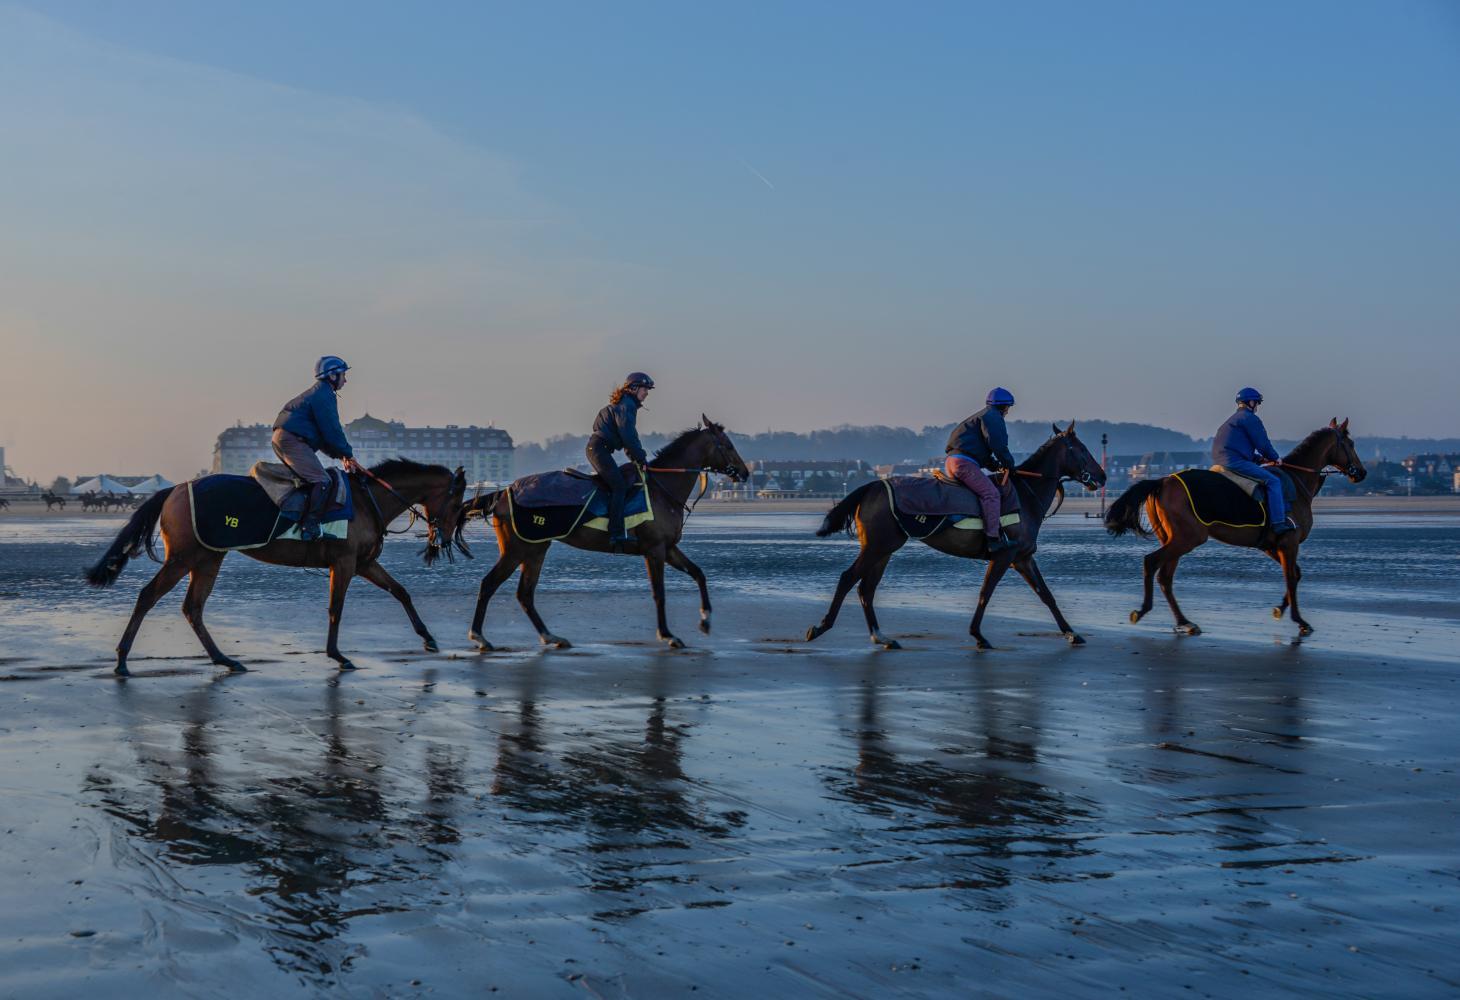 cheval_plage_beatrice_augier_1460x1000